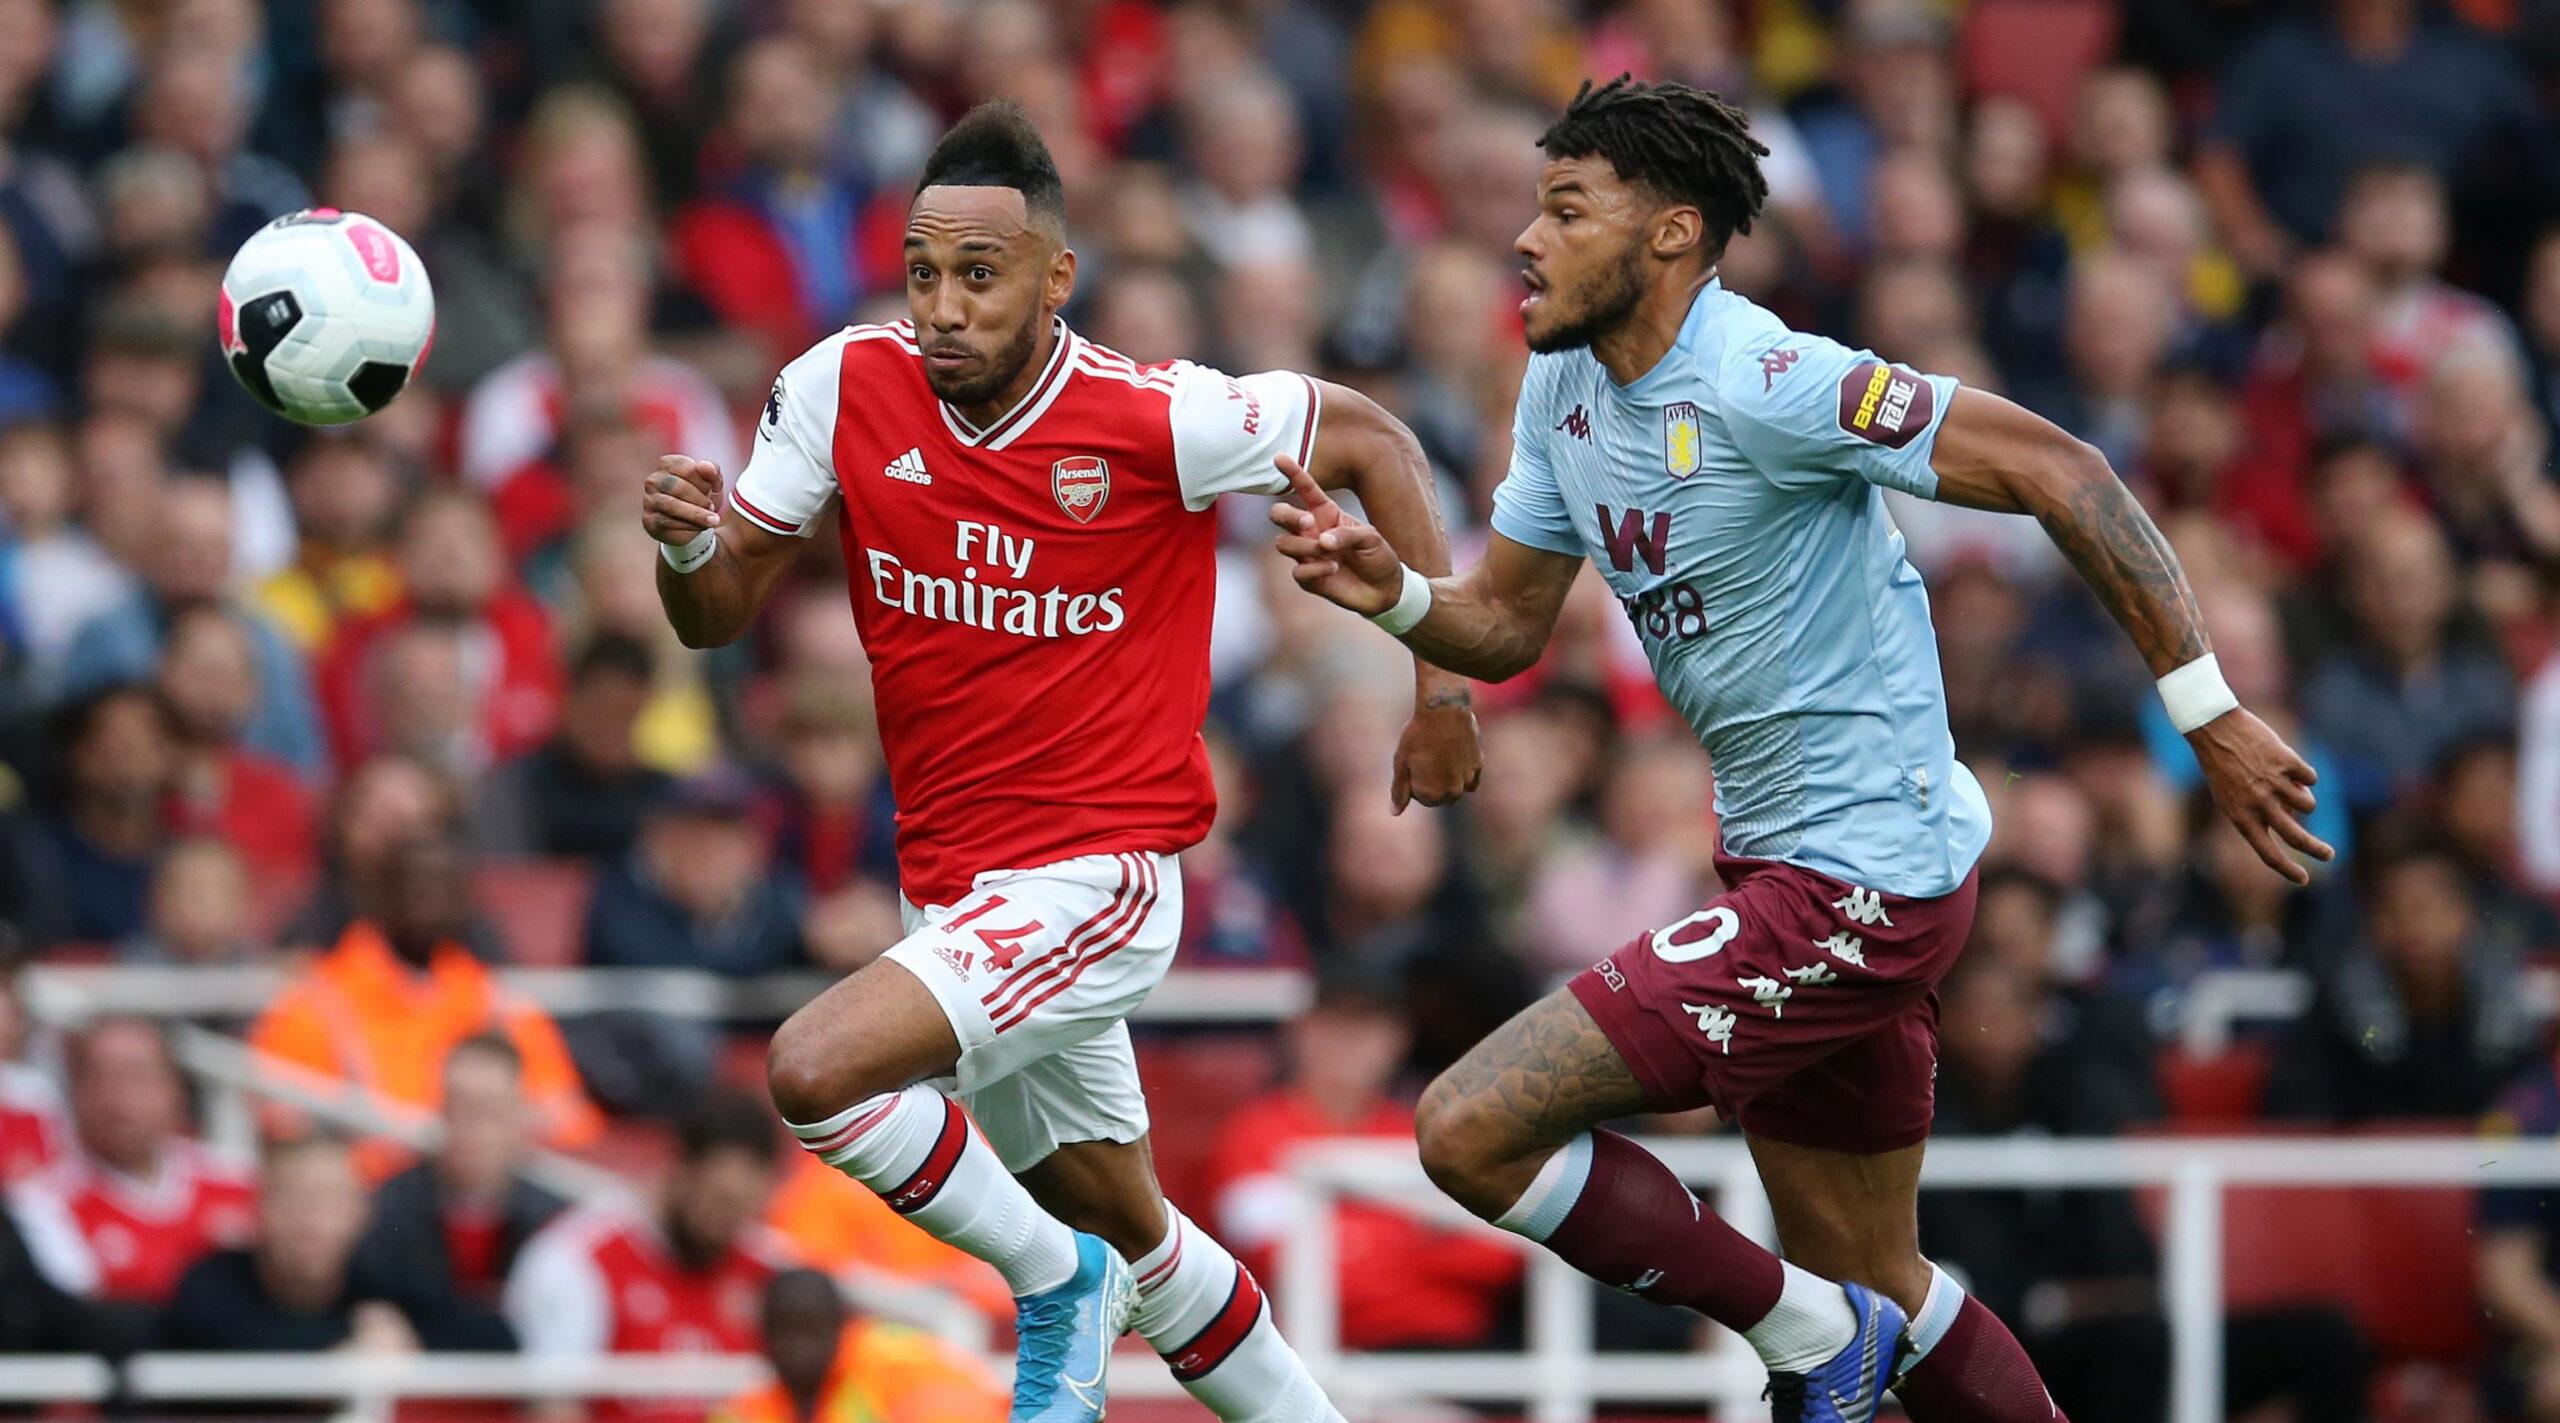 Nhan-dinh-Aston-Villa-vs-Arsenal